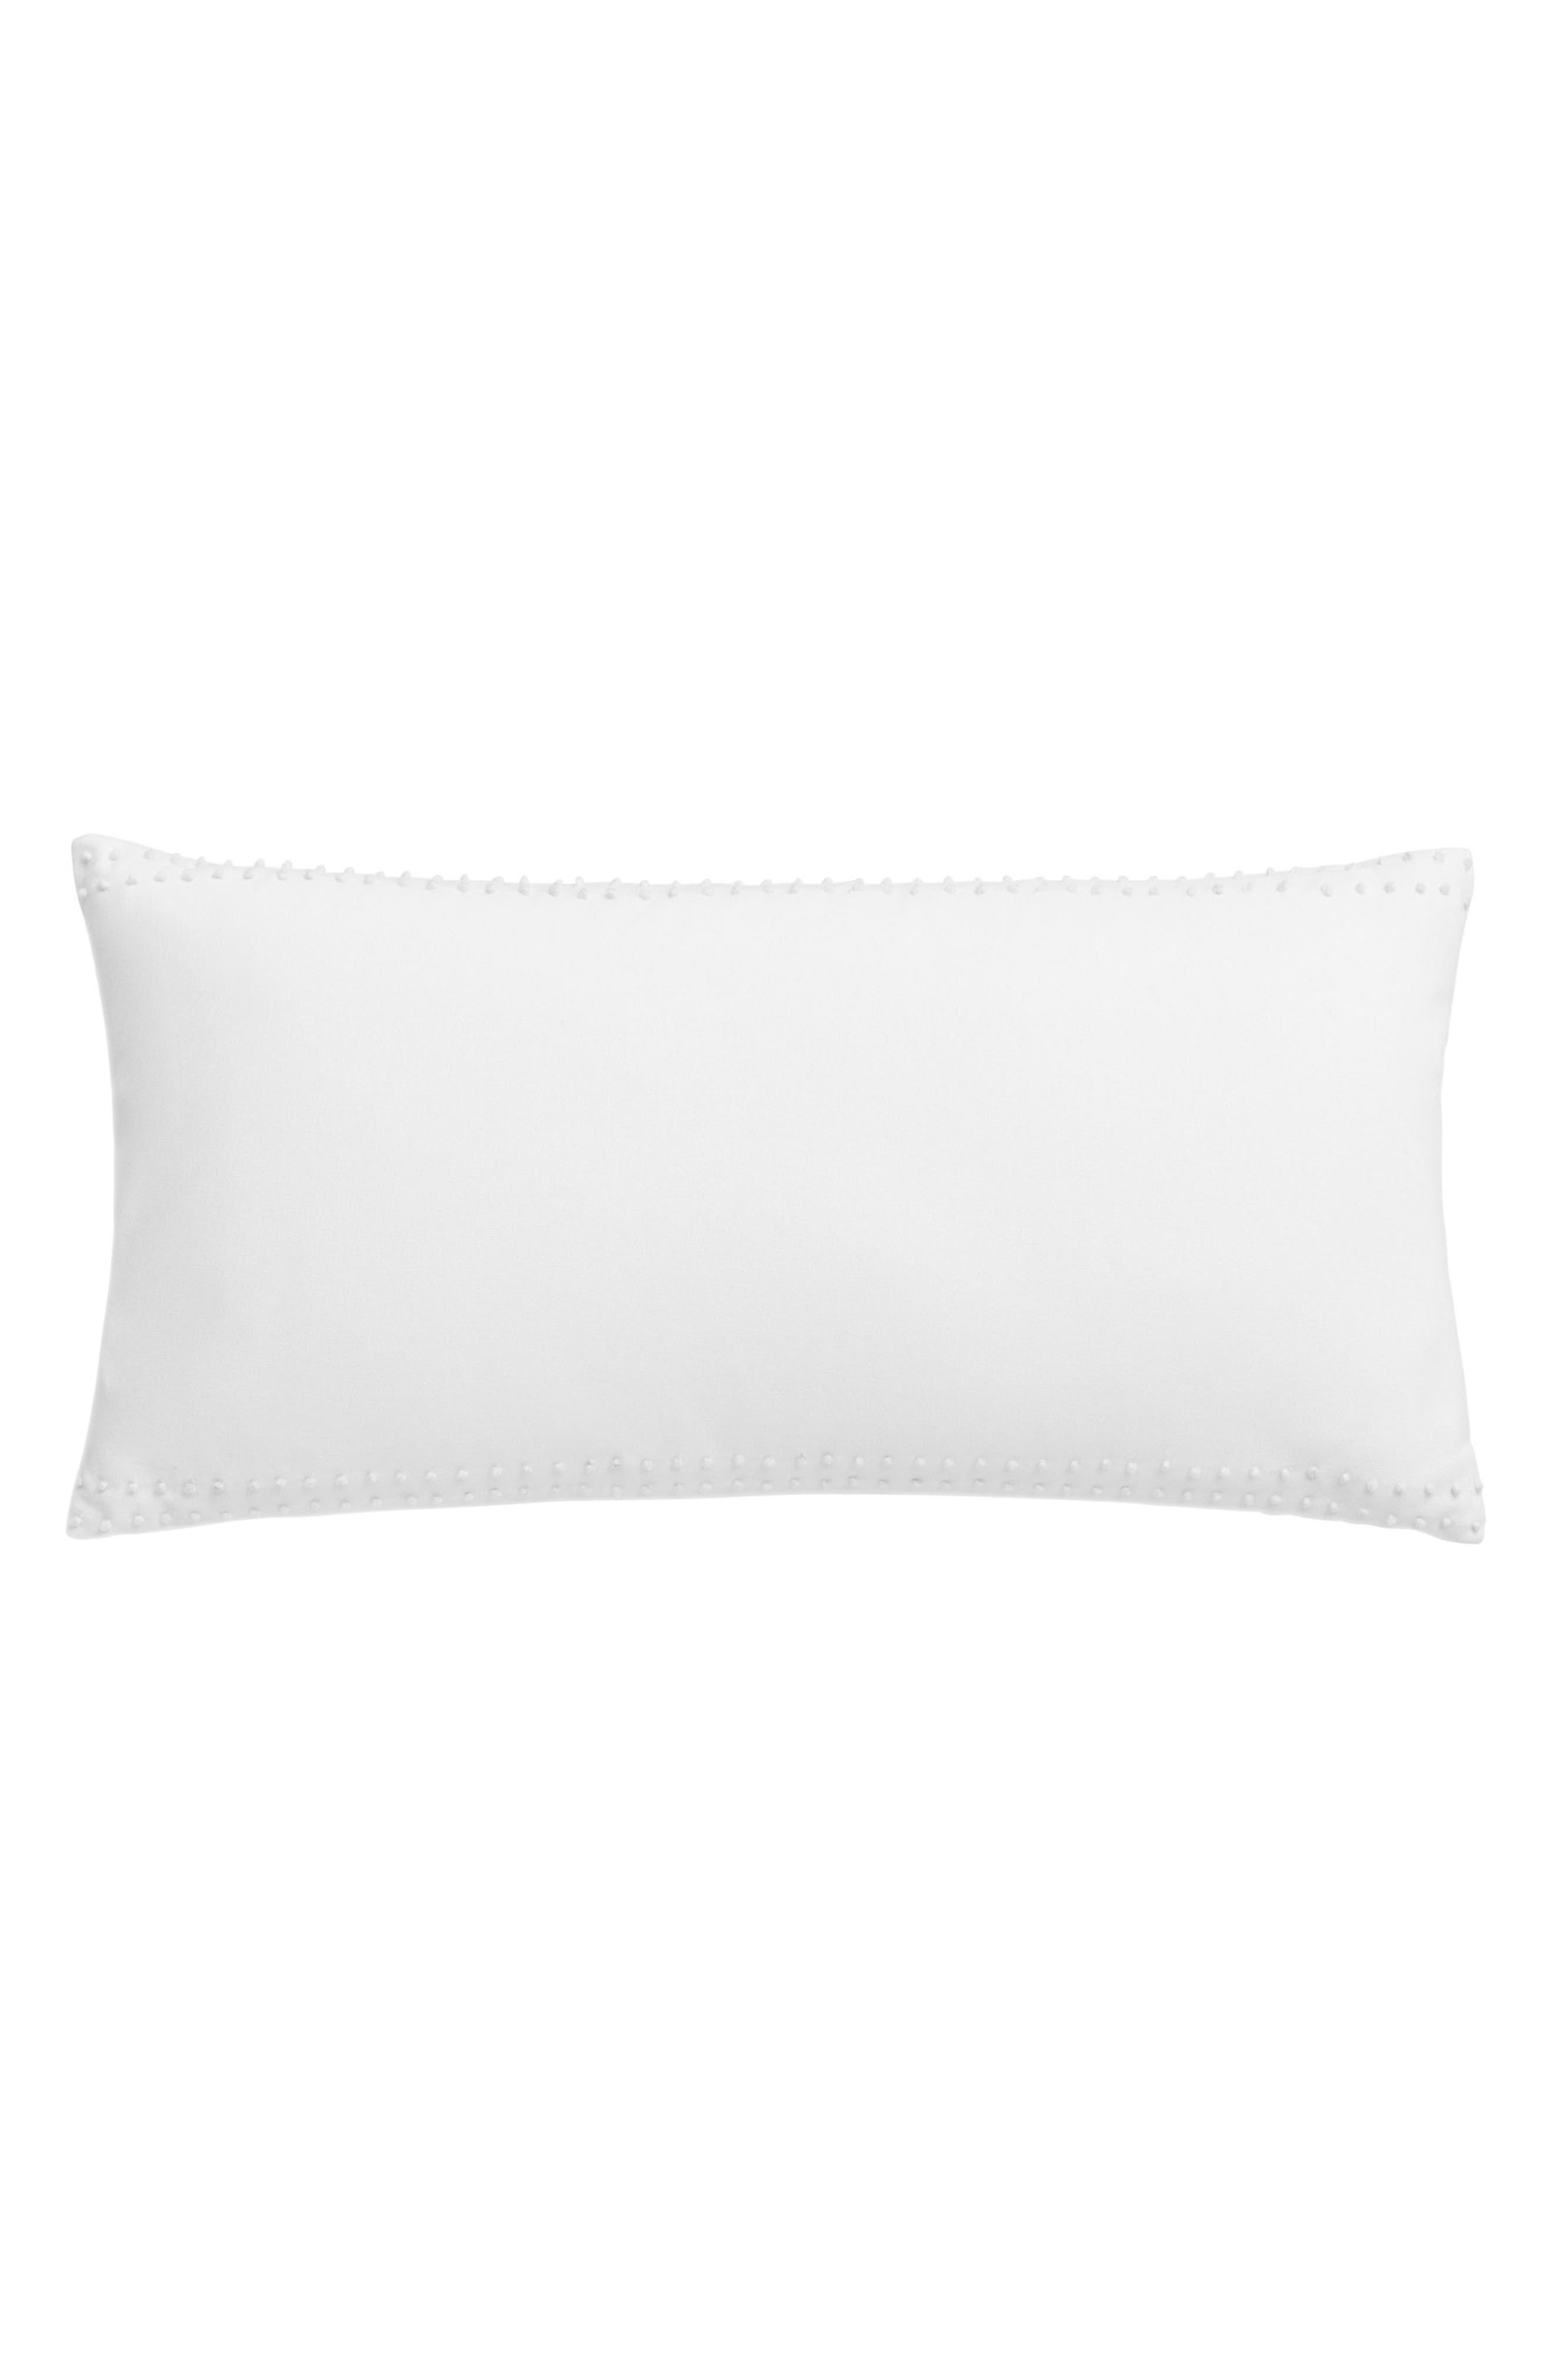 Blackpoint Hex Pillow,                             Main thumbnail 1, color,                             100